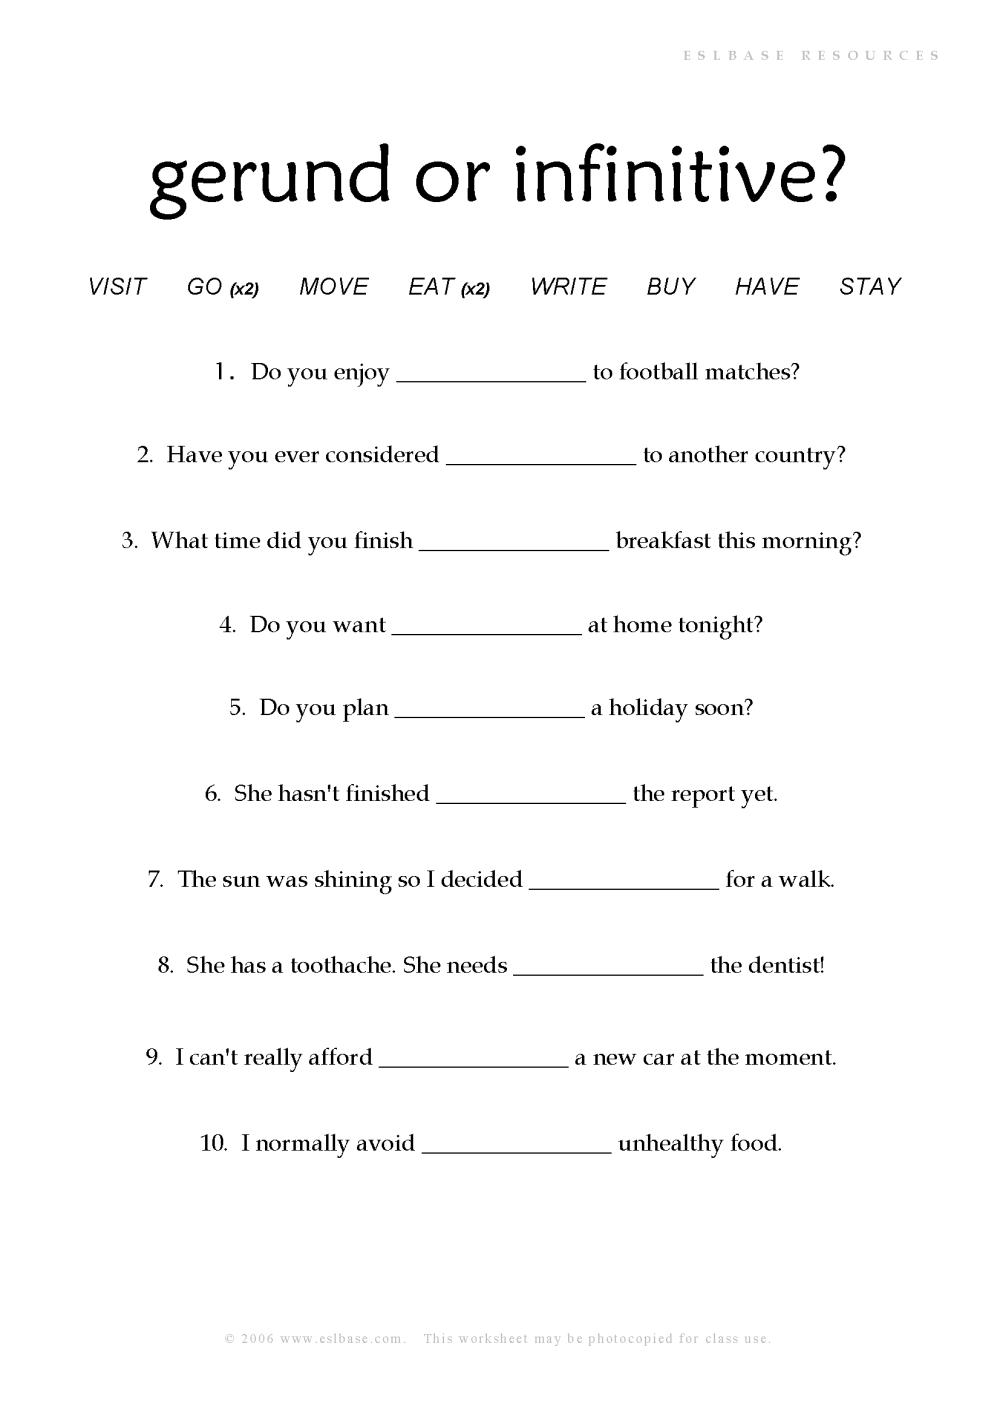 medium resolution of 34 Gerund Or Infinitive Worksheet - Free Worksheet Spreadsheet